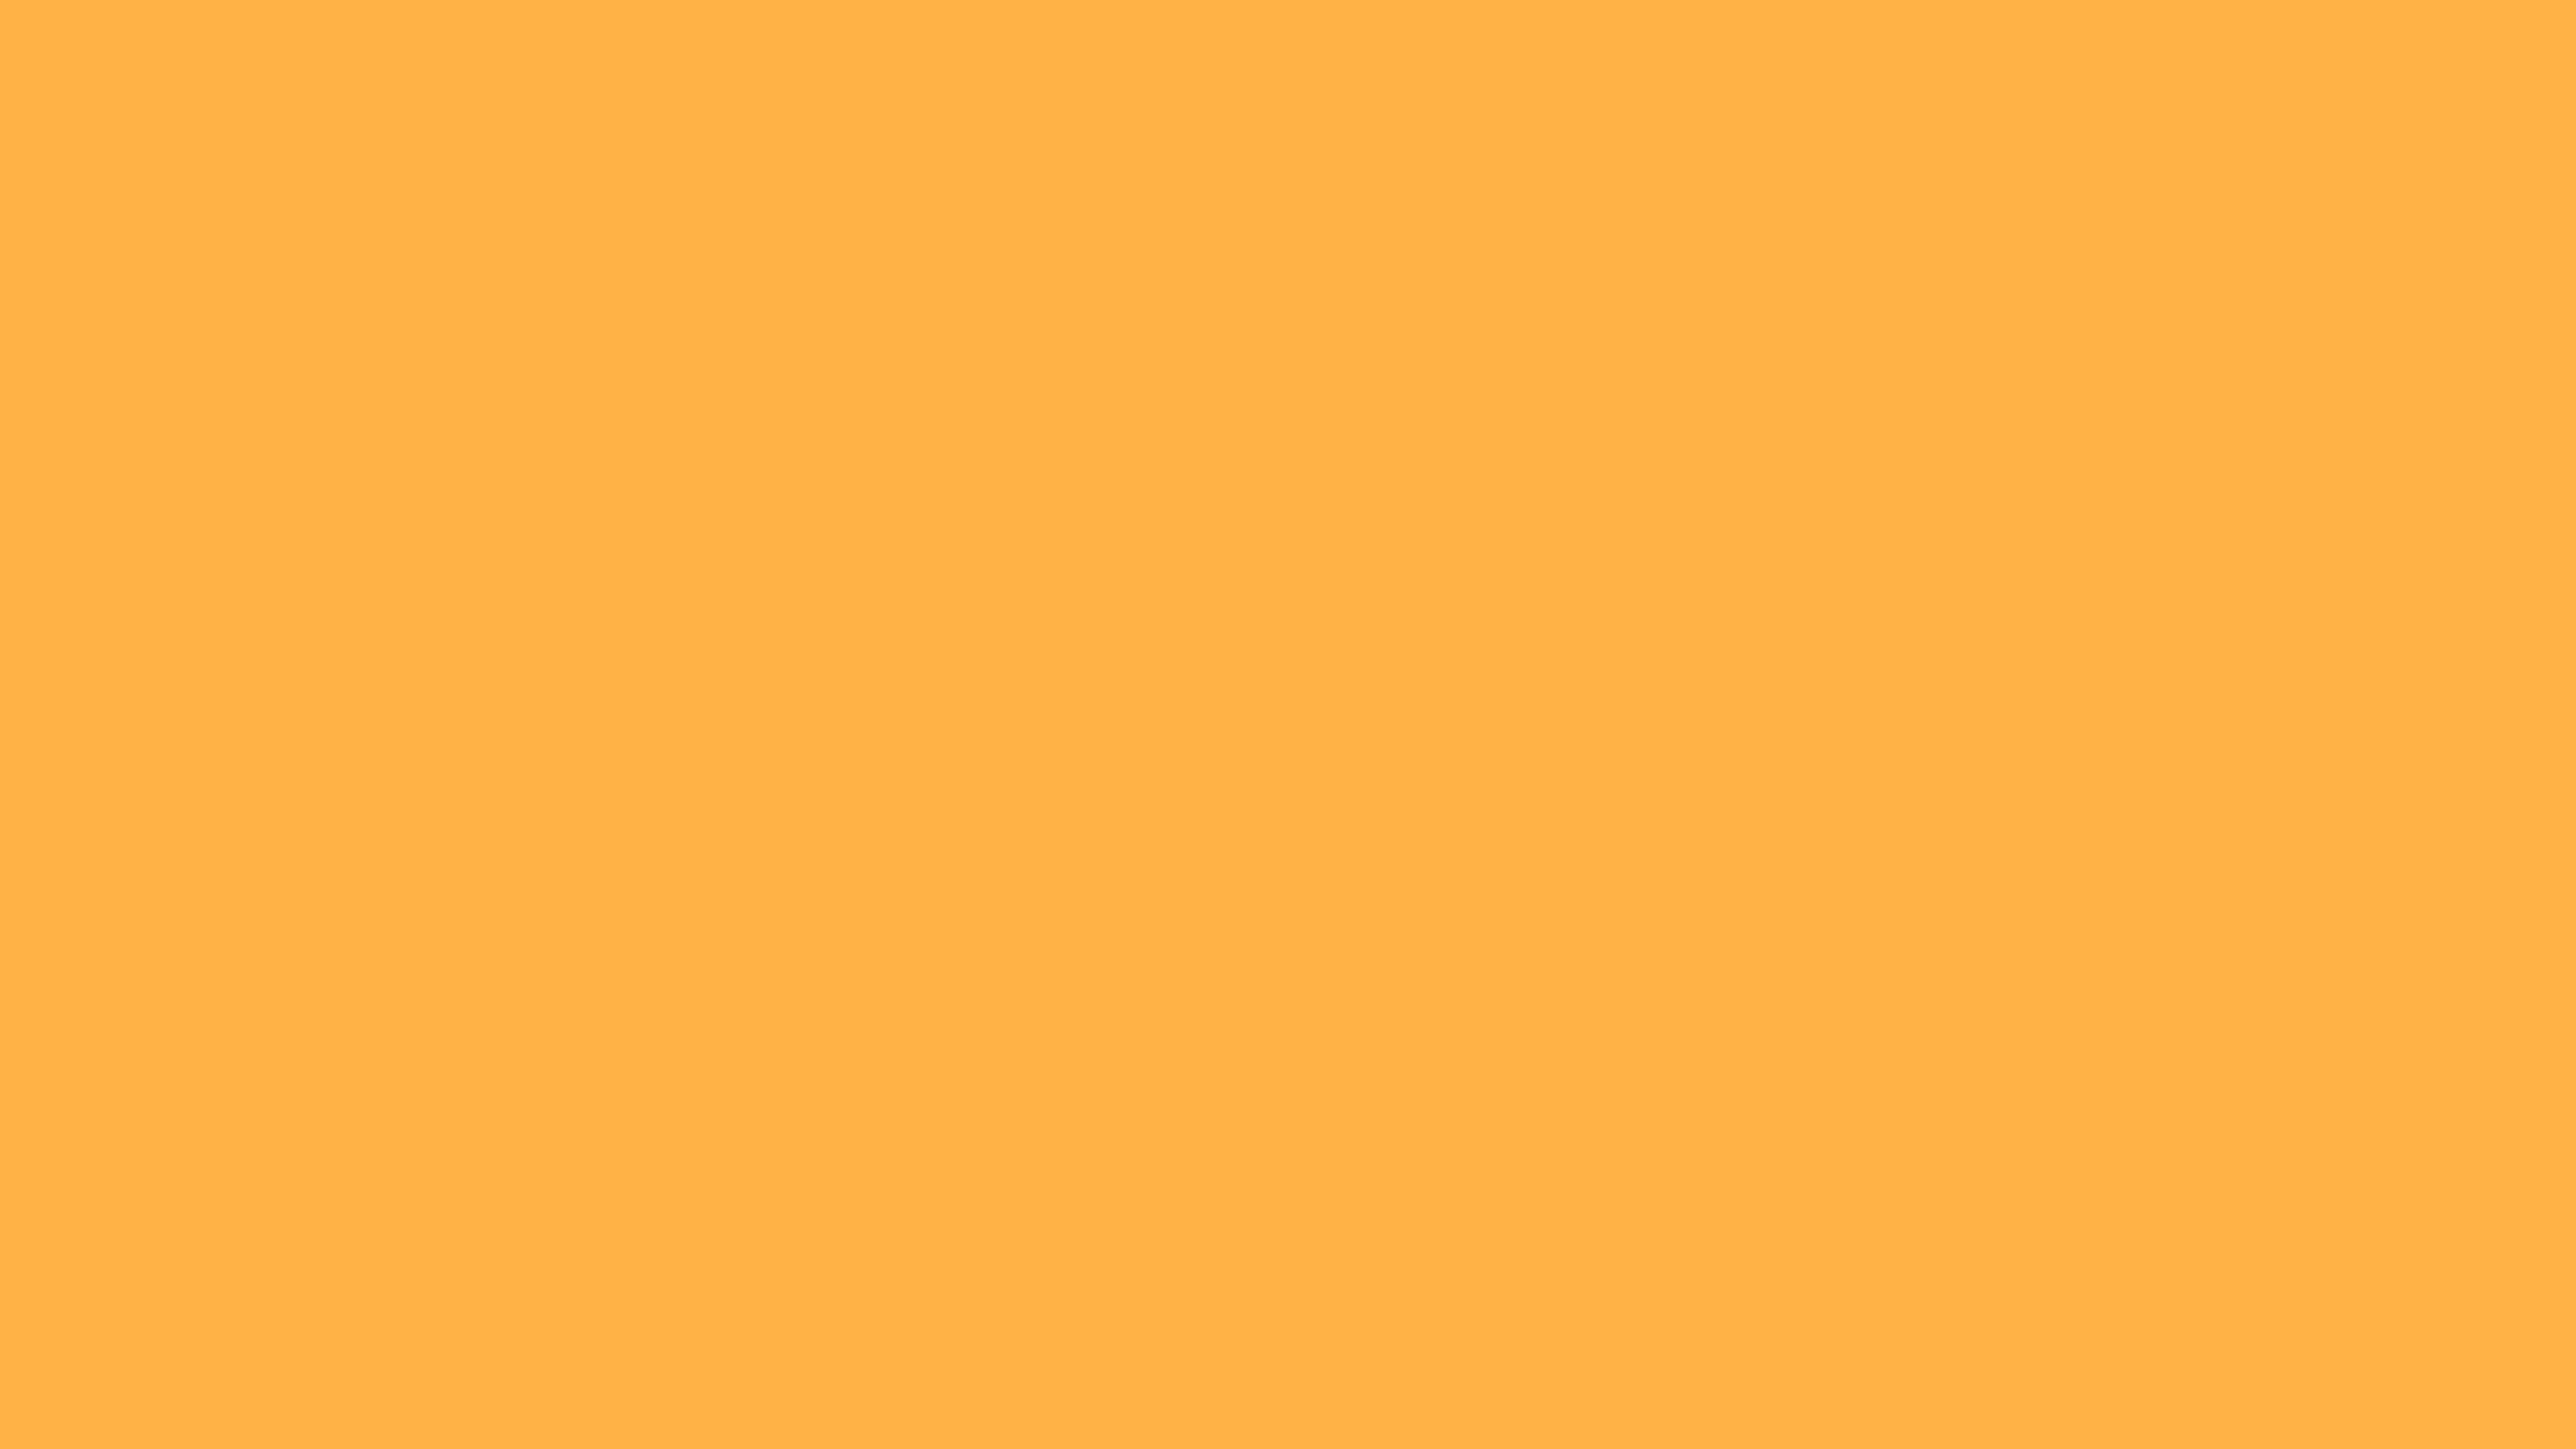 7680x4320 Pastel Orange Solid Color Background